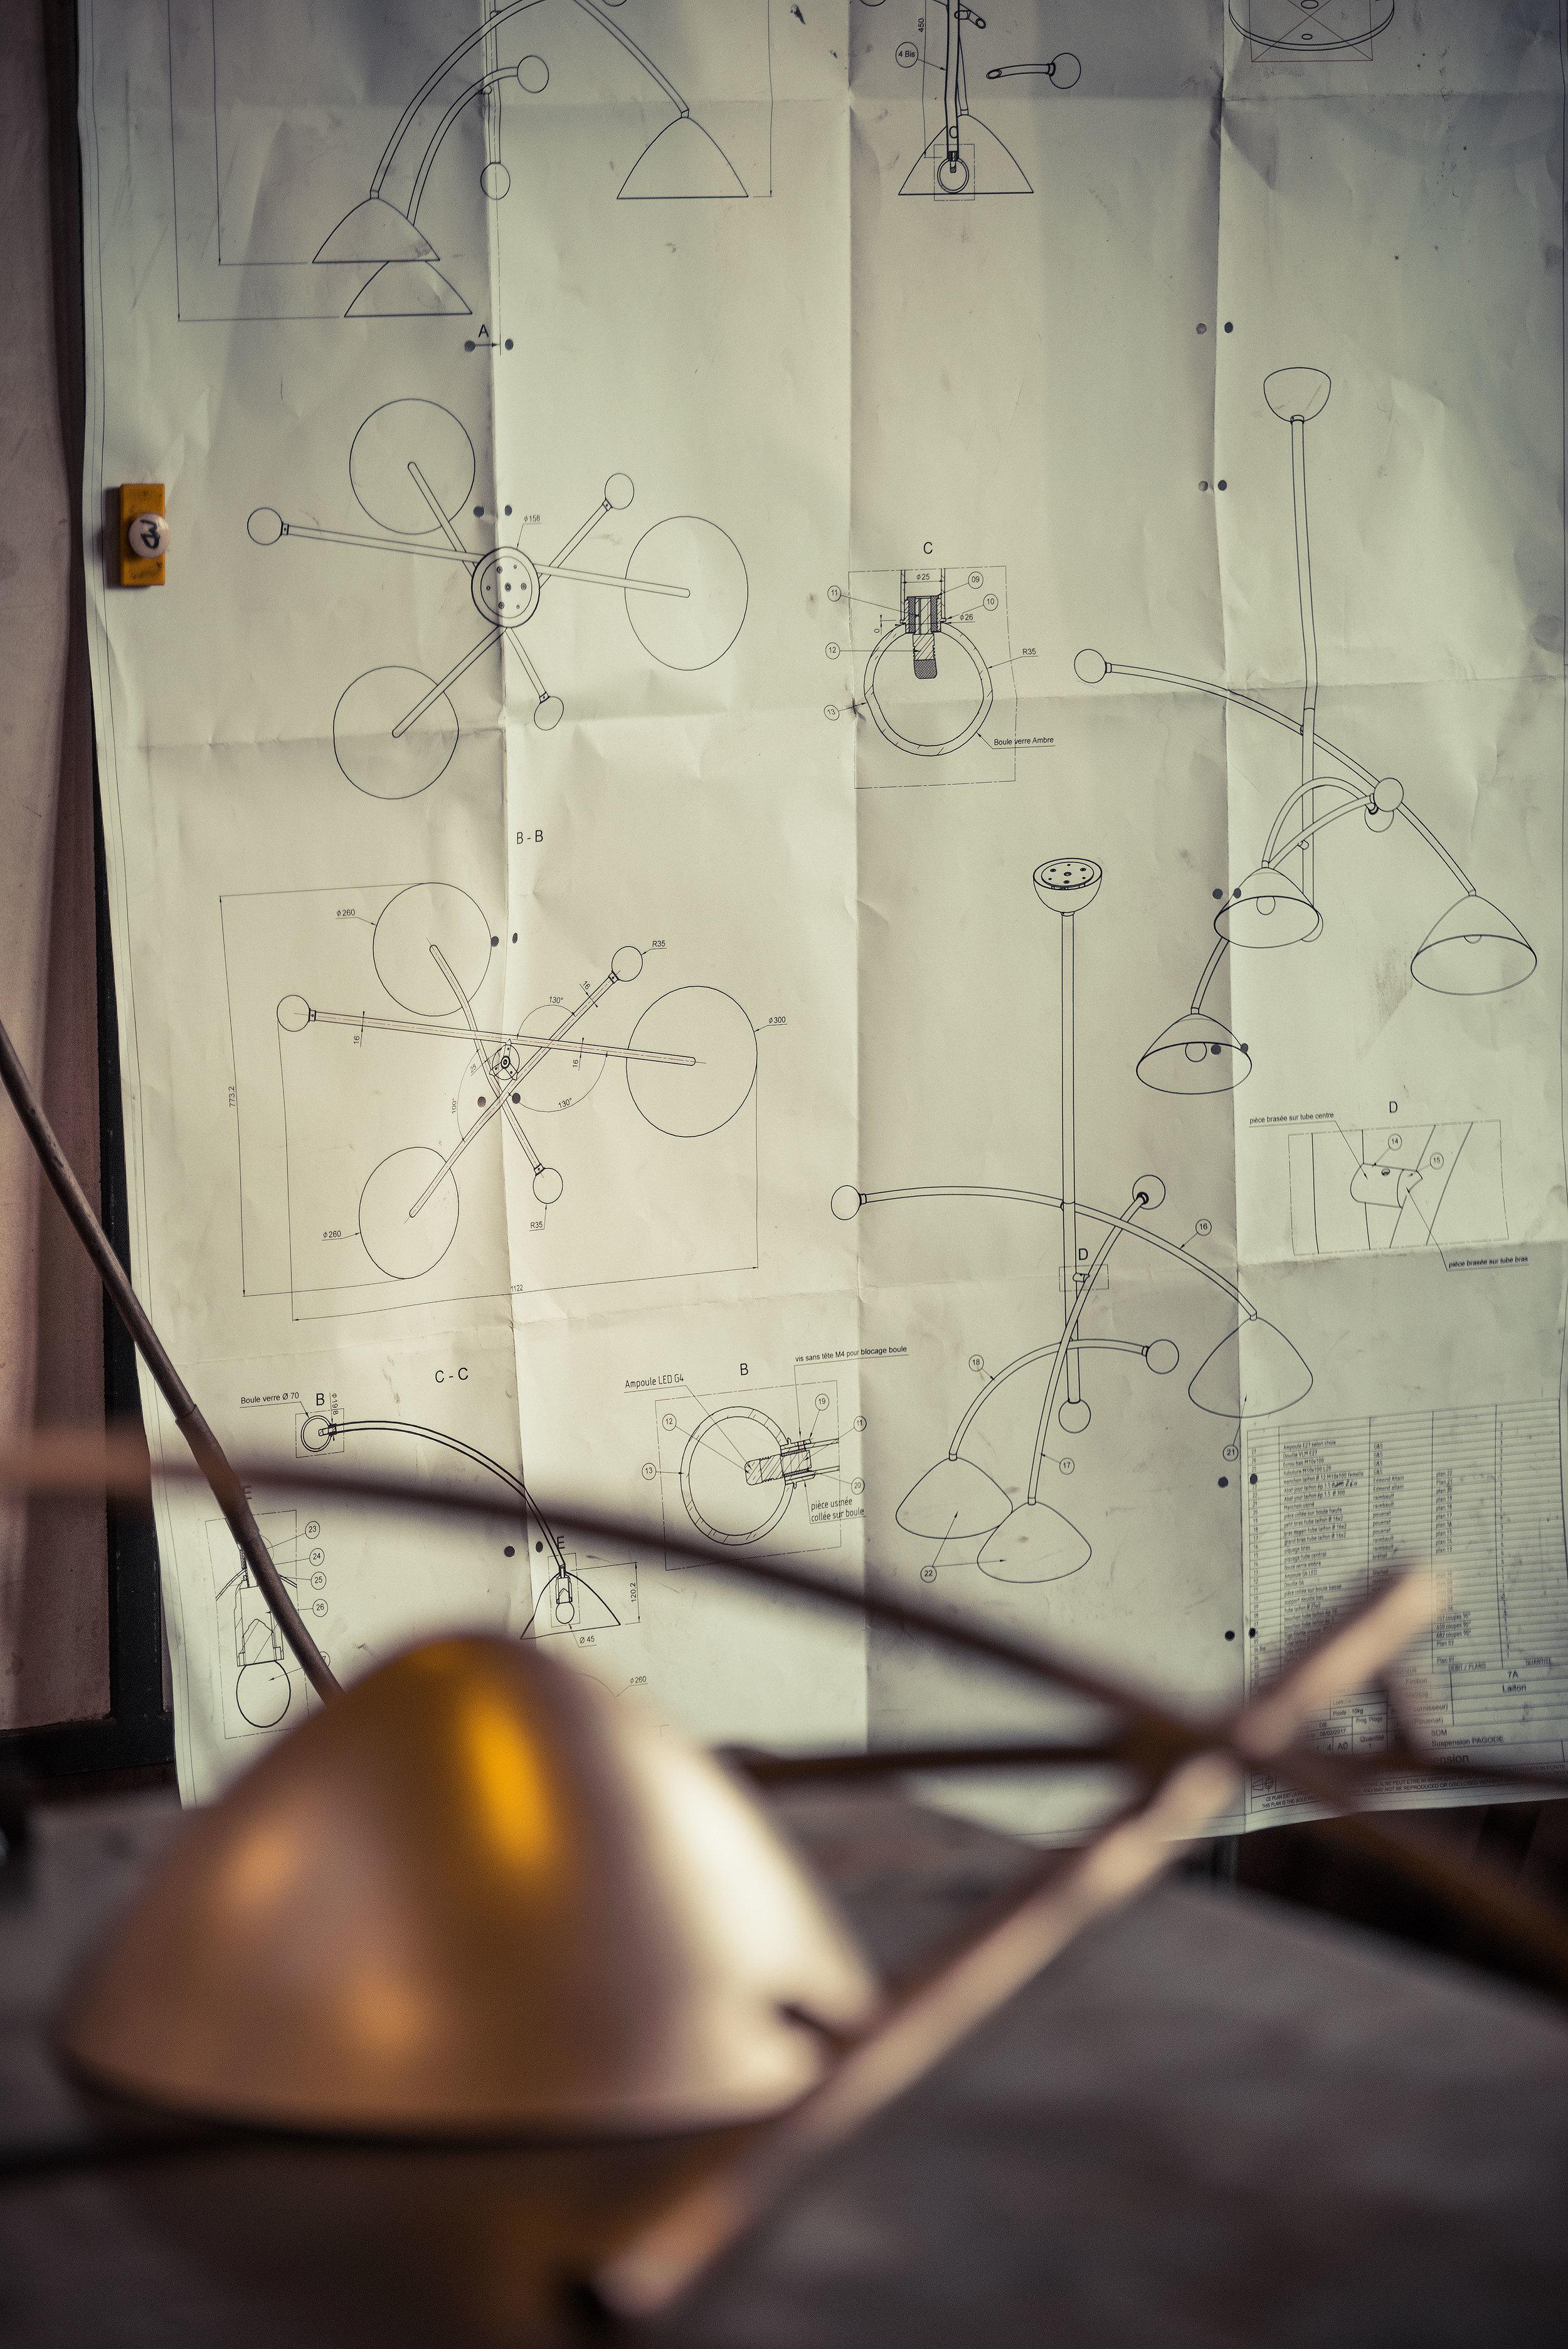 Photo Atelier - Suspension Pagode - Sybille de Margerie - Sylvain Claire (11).jpg